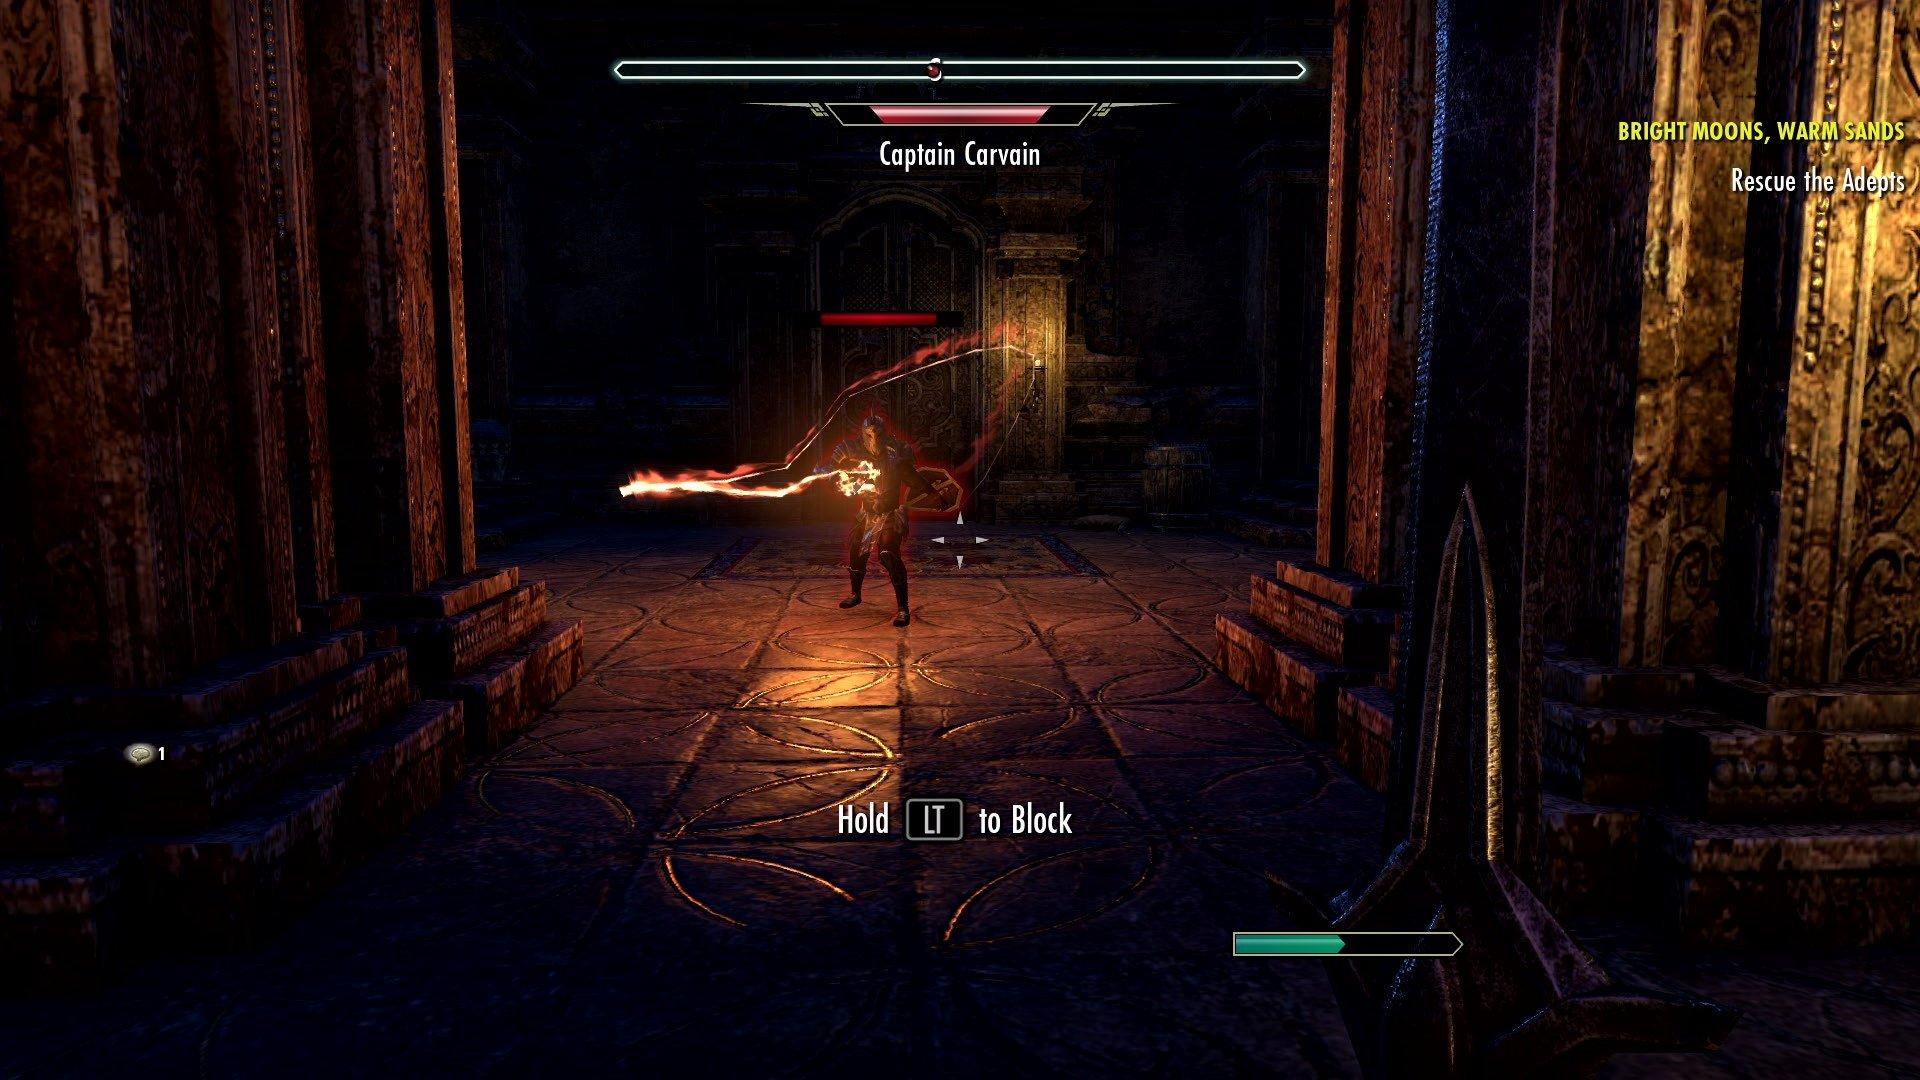 Llegan los dragones! Así es The Elder Scrolls Online: Elsweyr - Xbox